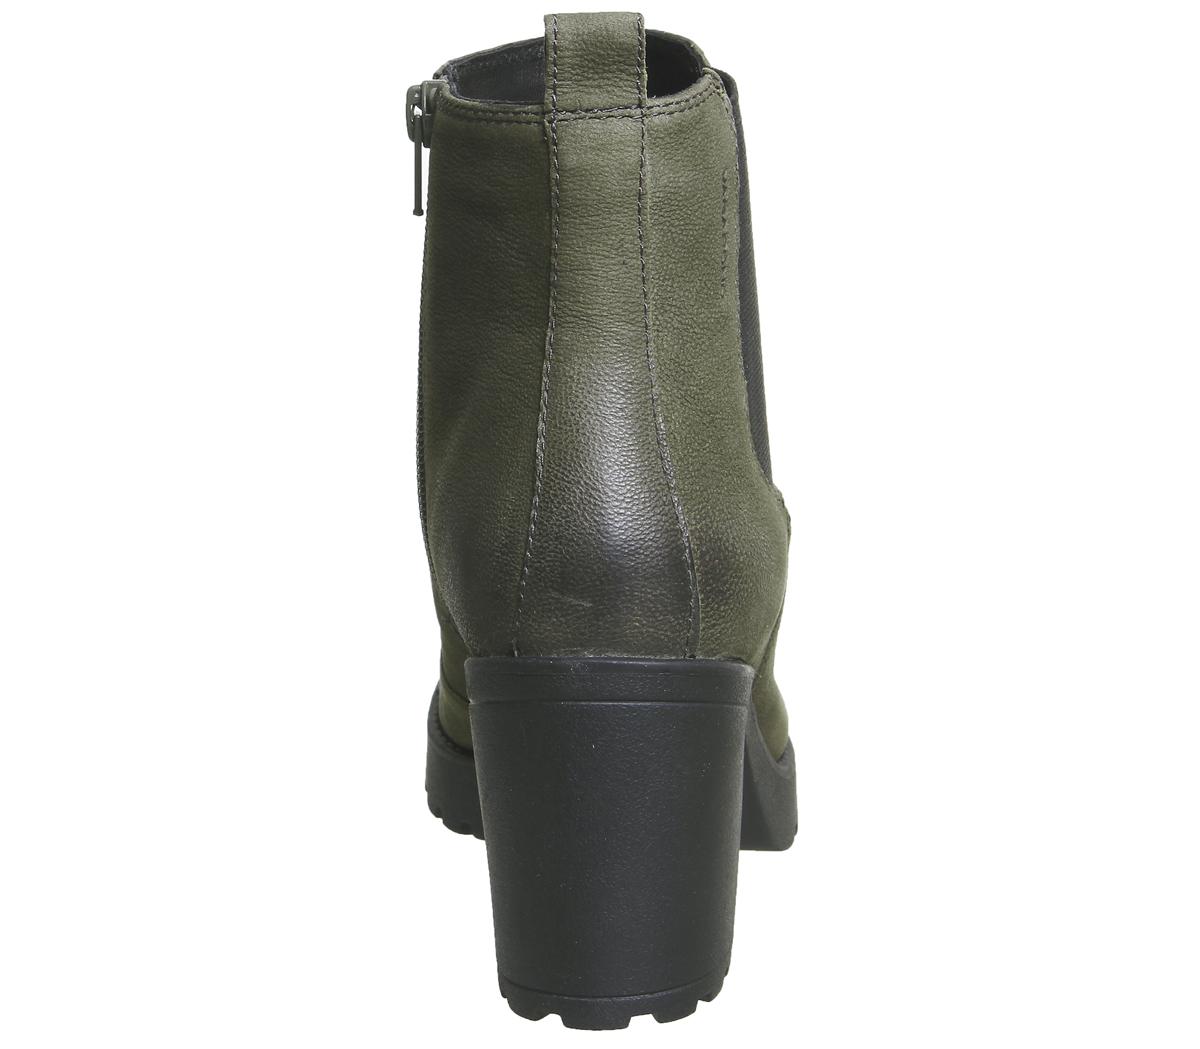 274e923e56fc Womens Vagabond Grace Heeled Chelsea Boots Dark Olive Nubuck Boots ...